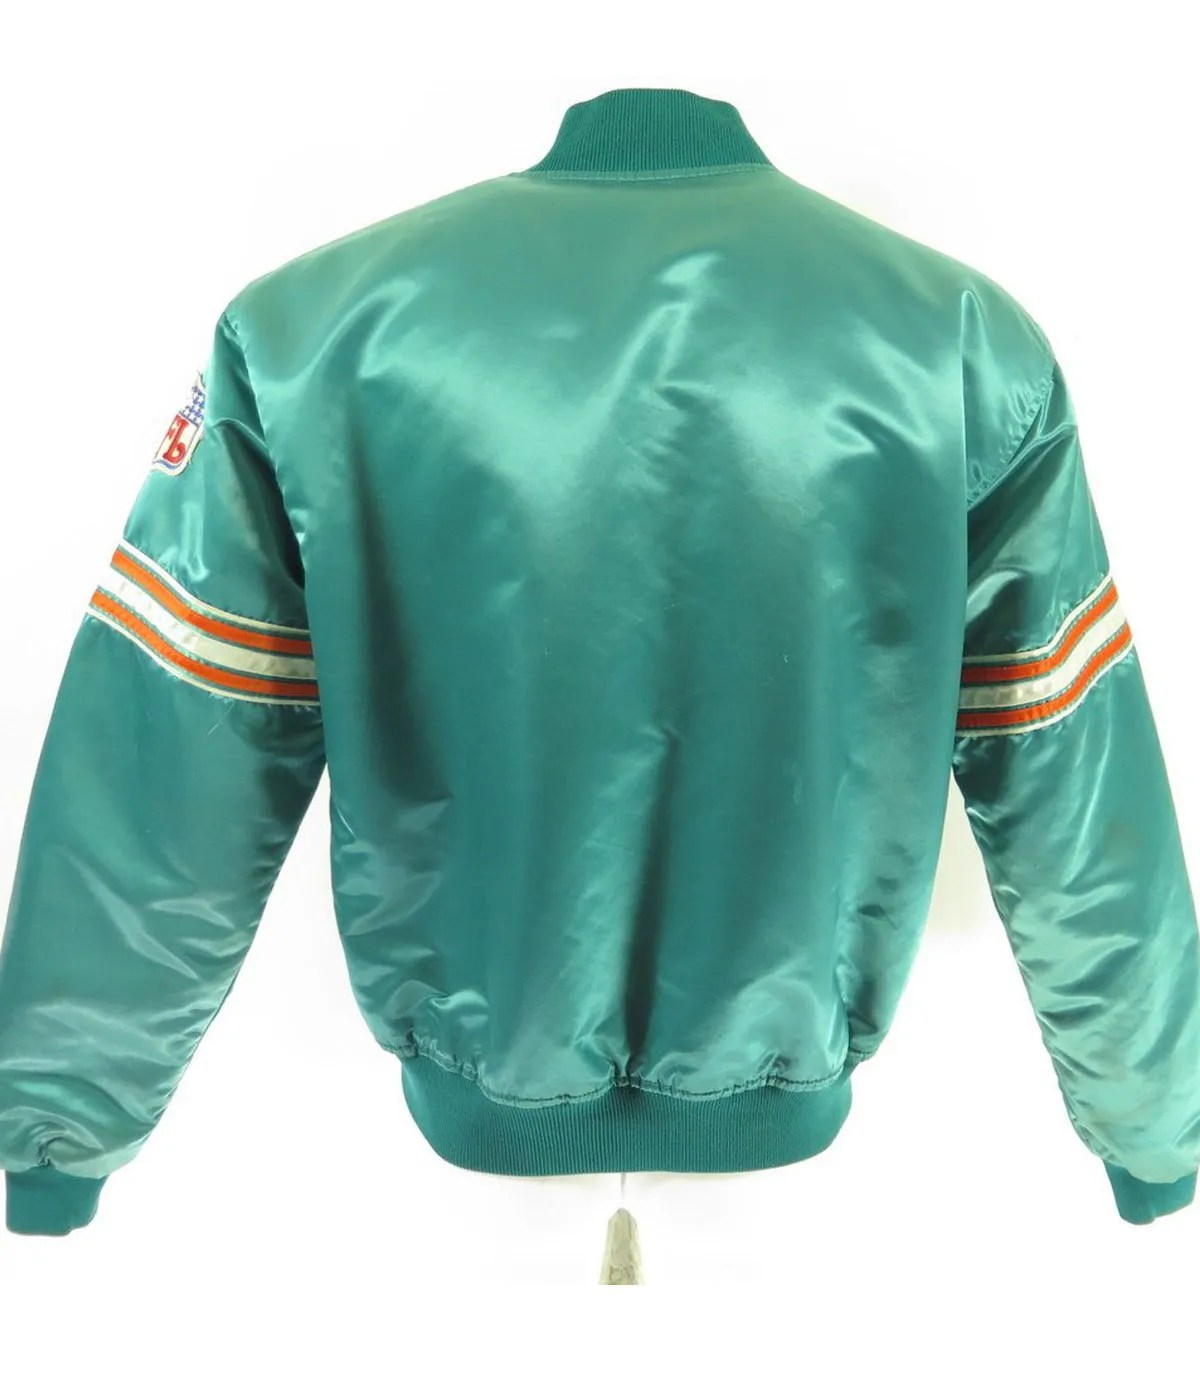 80s-miami-dolphins-jacket